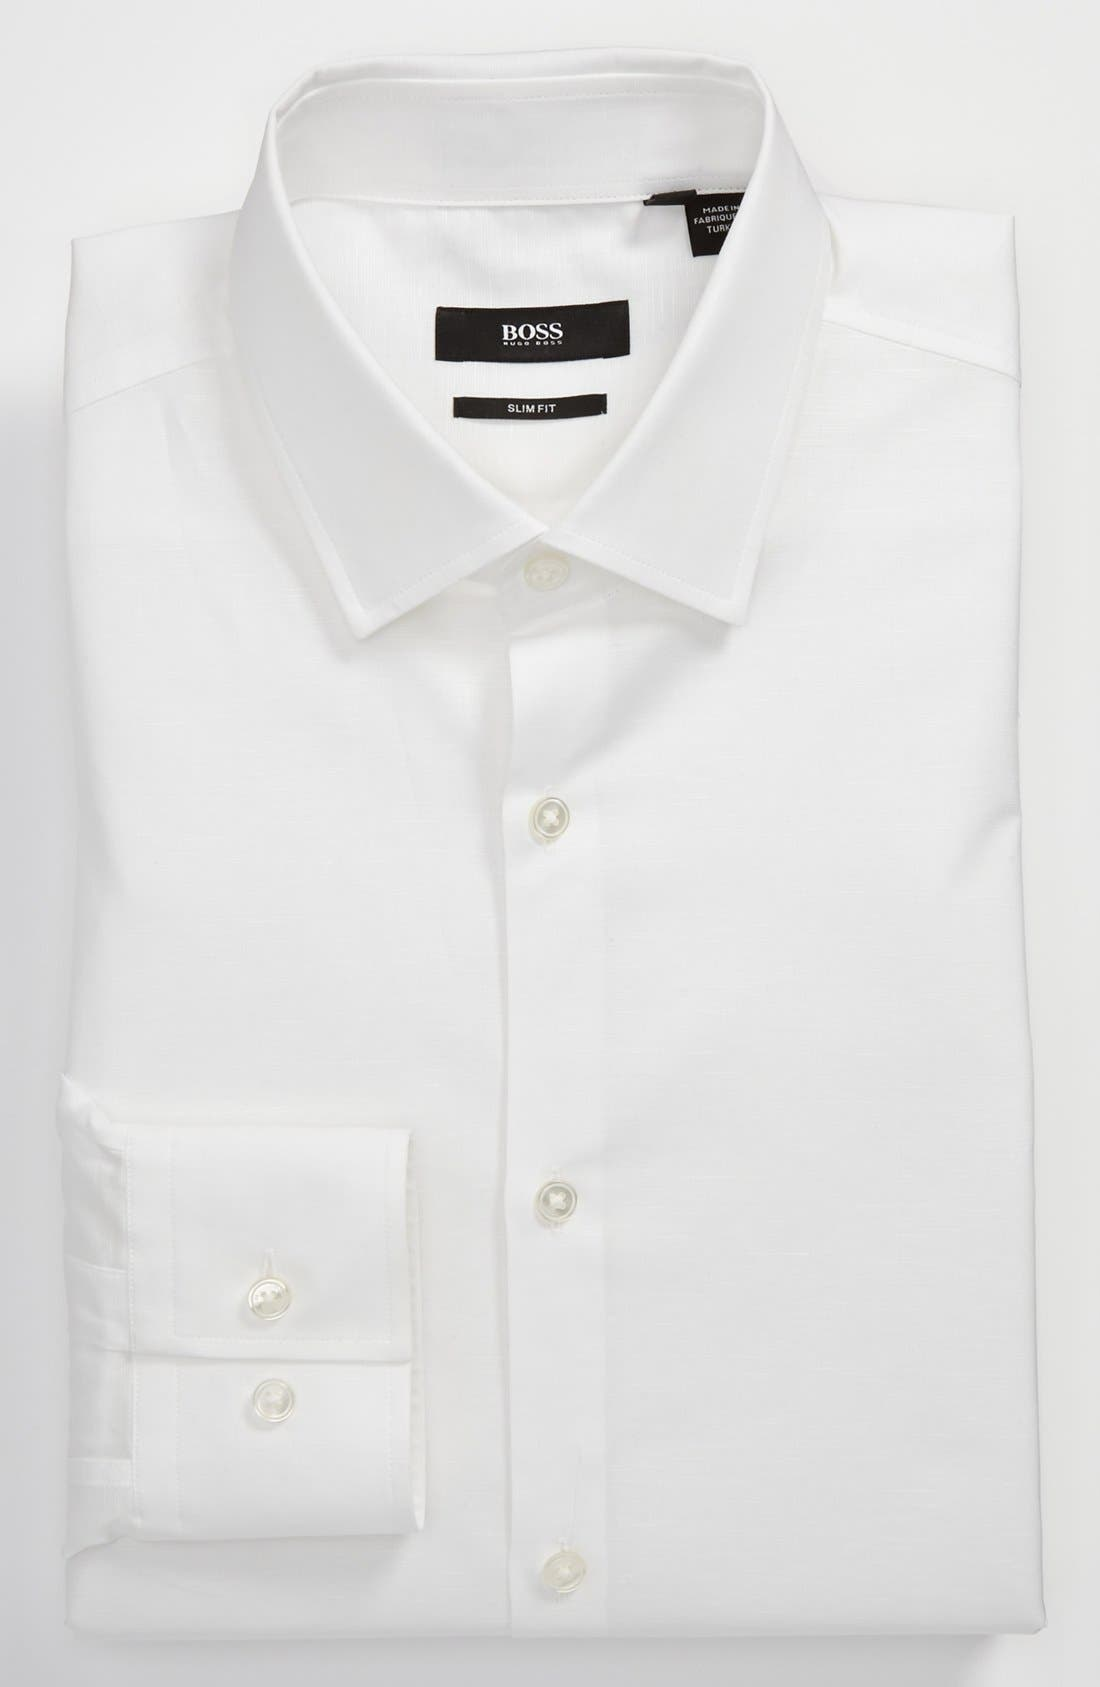 Main Image - BOSS HUGO BOSS 'Jenno' Slim Fit Linen Dress Shirt